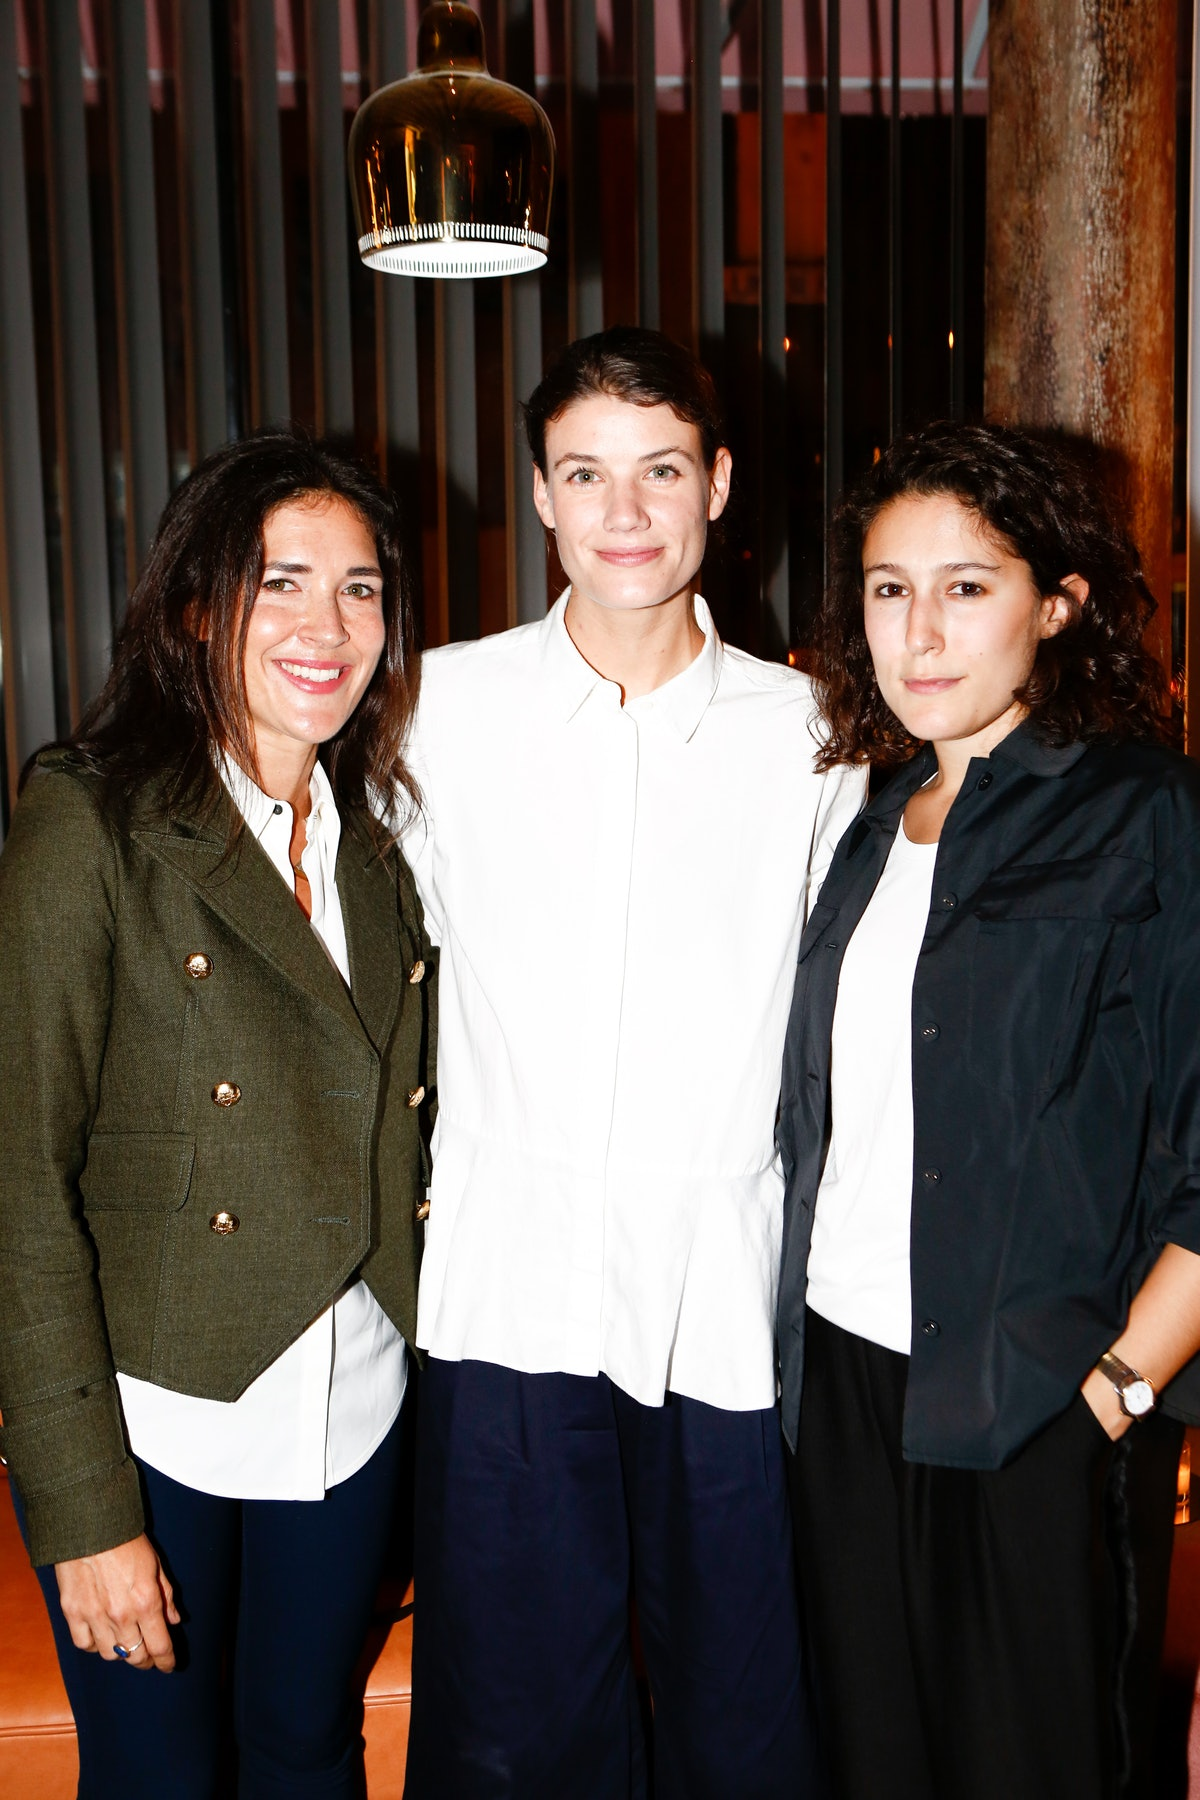 Erin Isakov, Britt Cosgrove, and Marina Polo